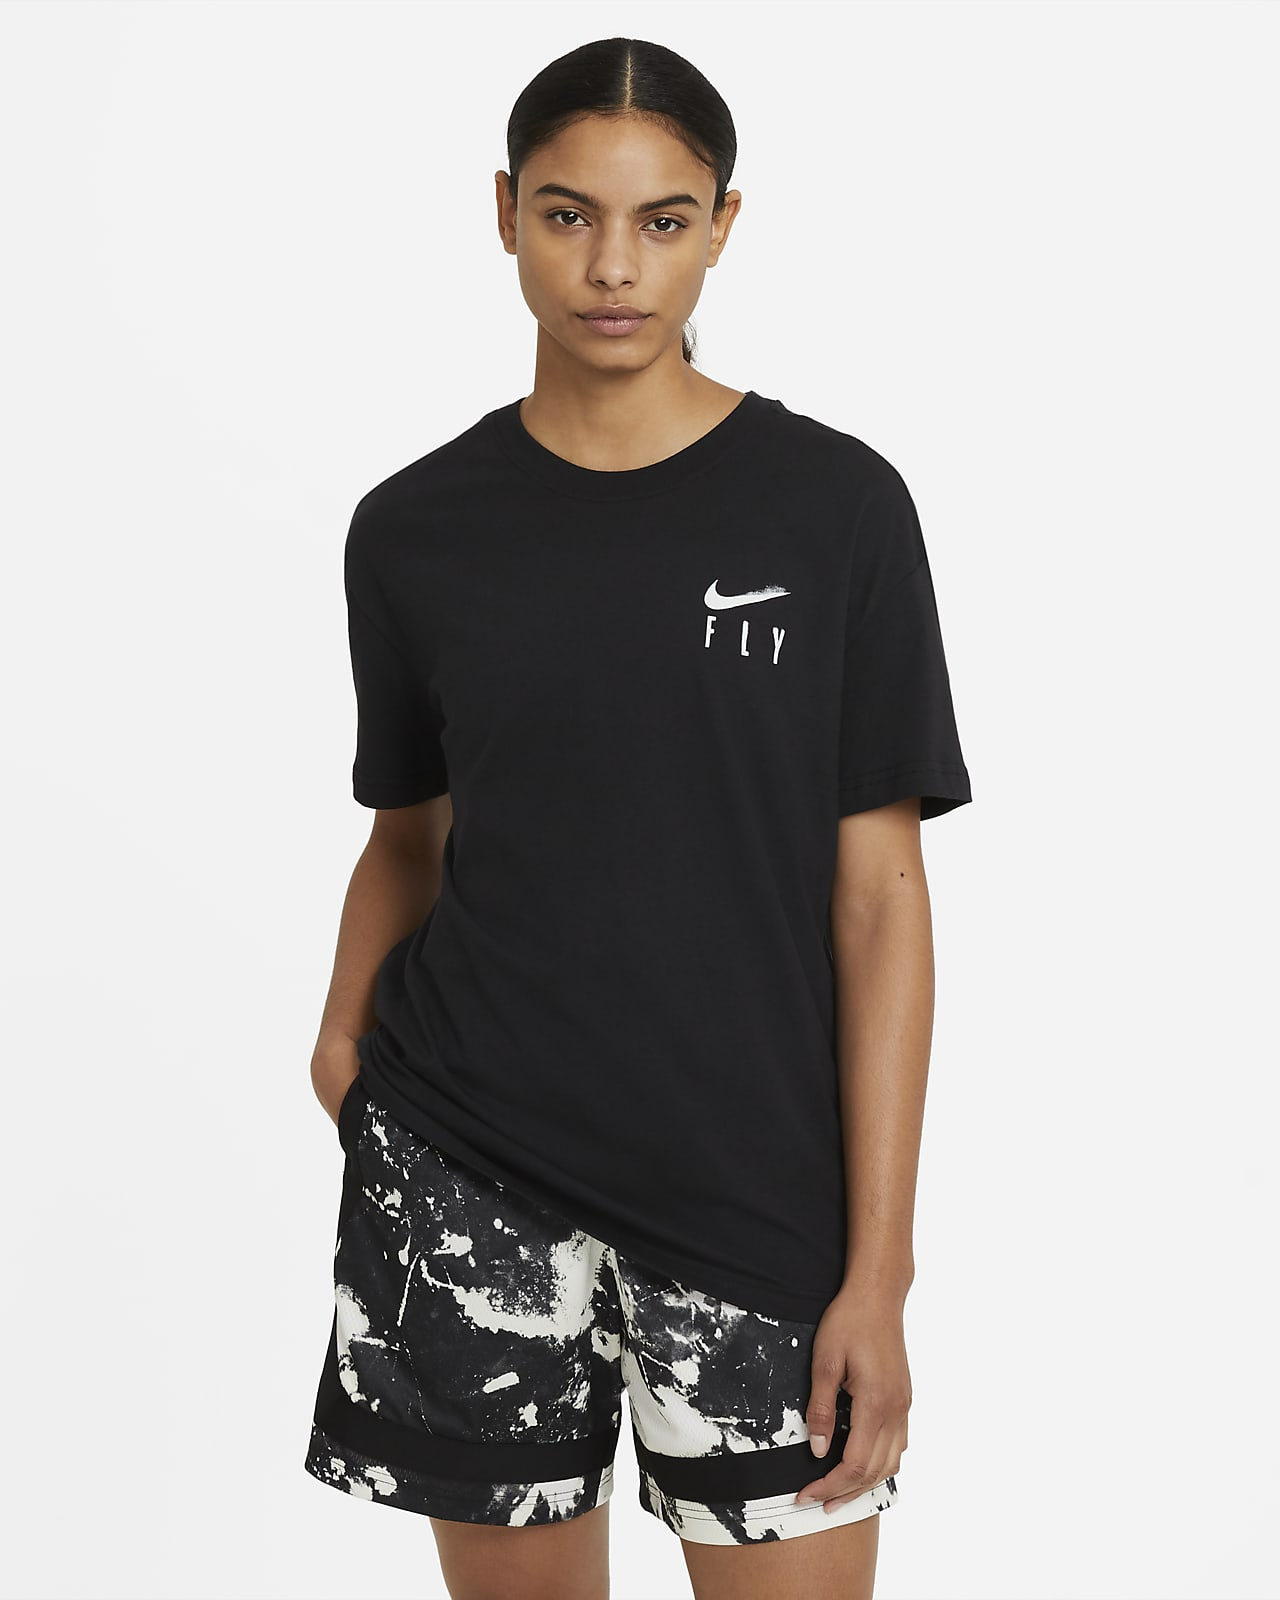 Nike Fly Damen-Basketball-T-Shirt